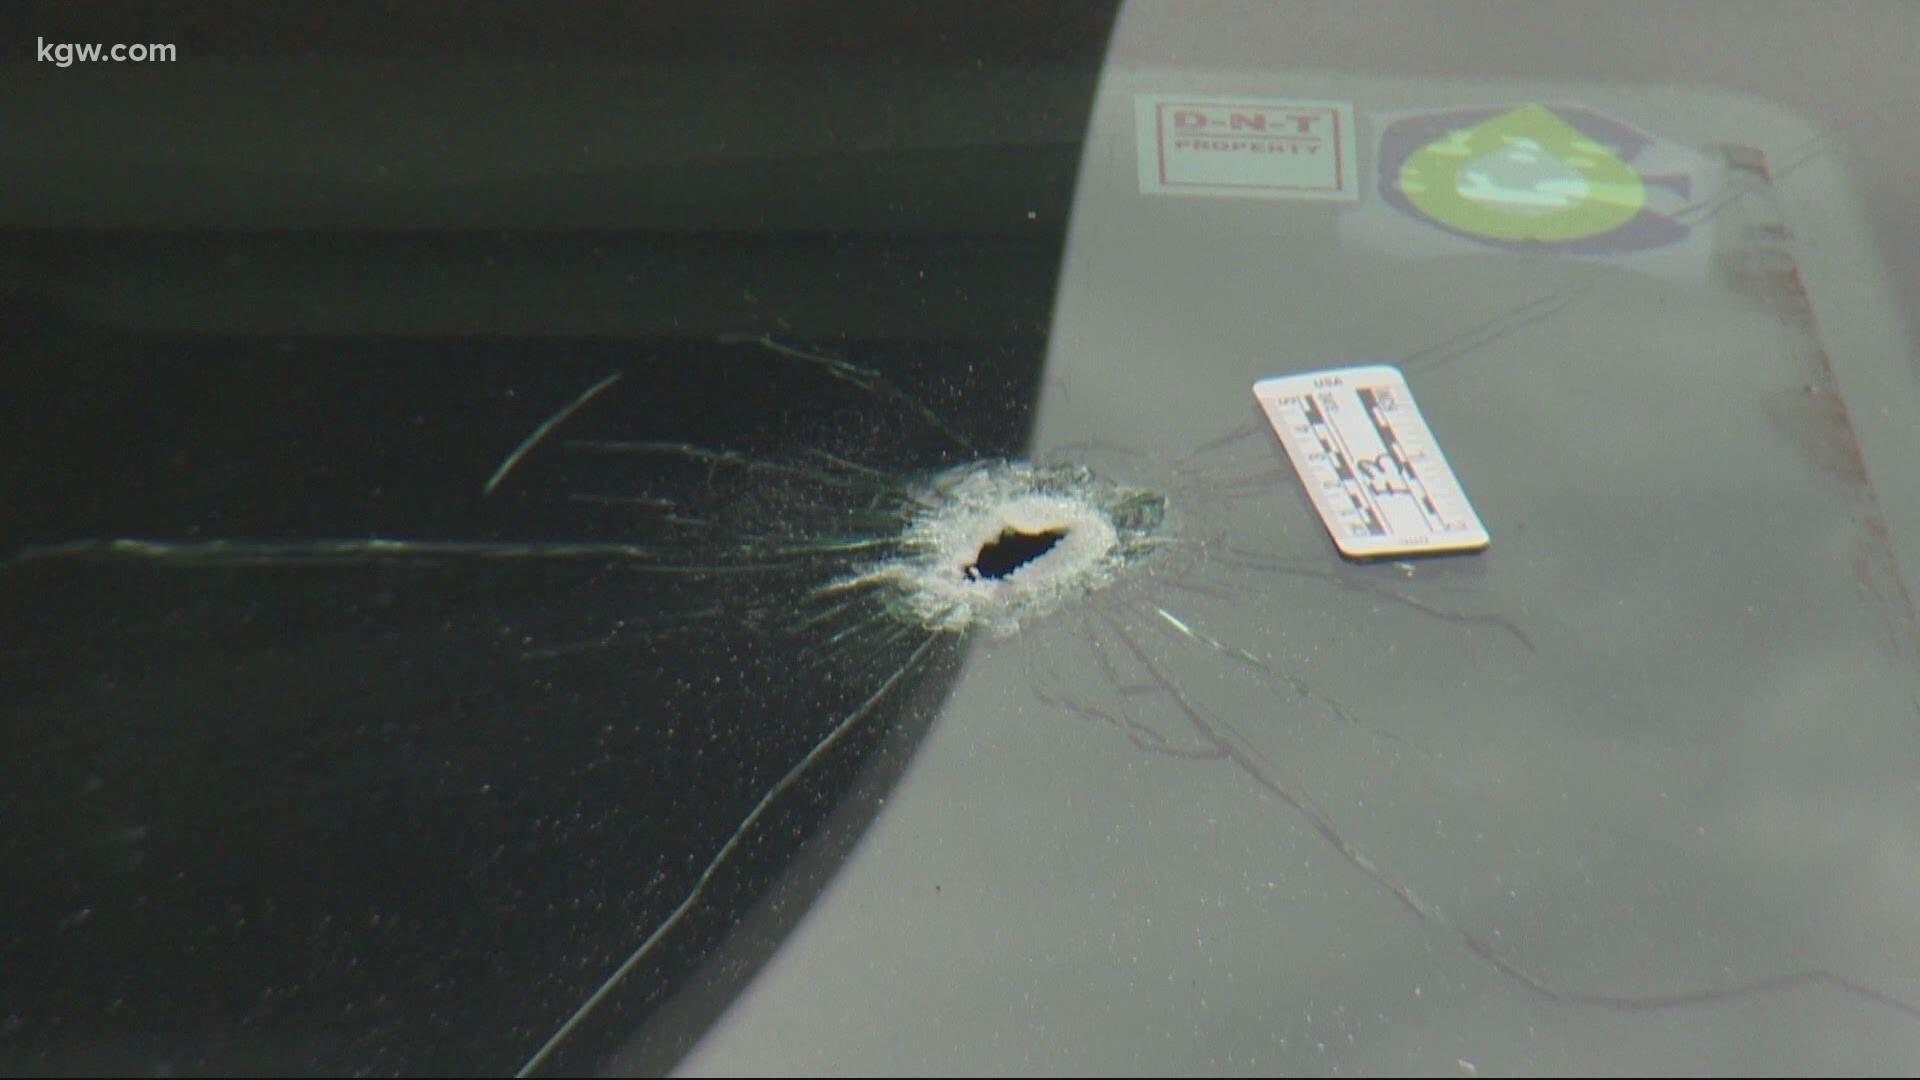 Ne Portland Apartment Complex Riddled With 150 Bullets Kgw Com